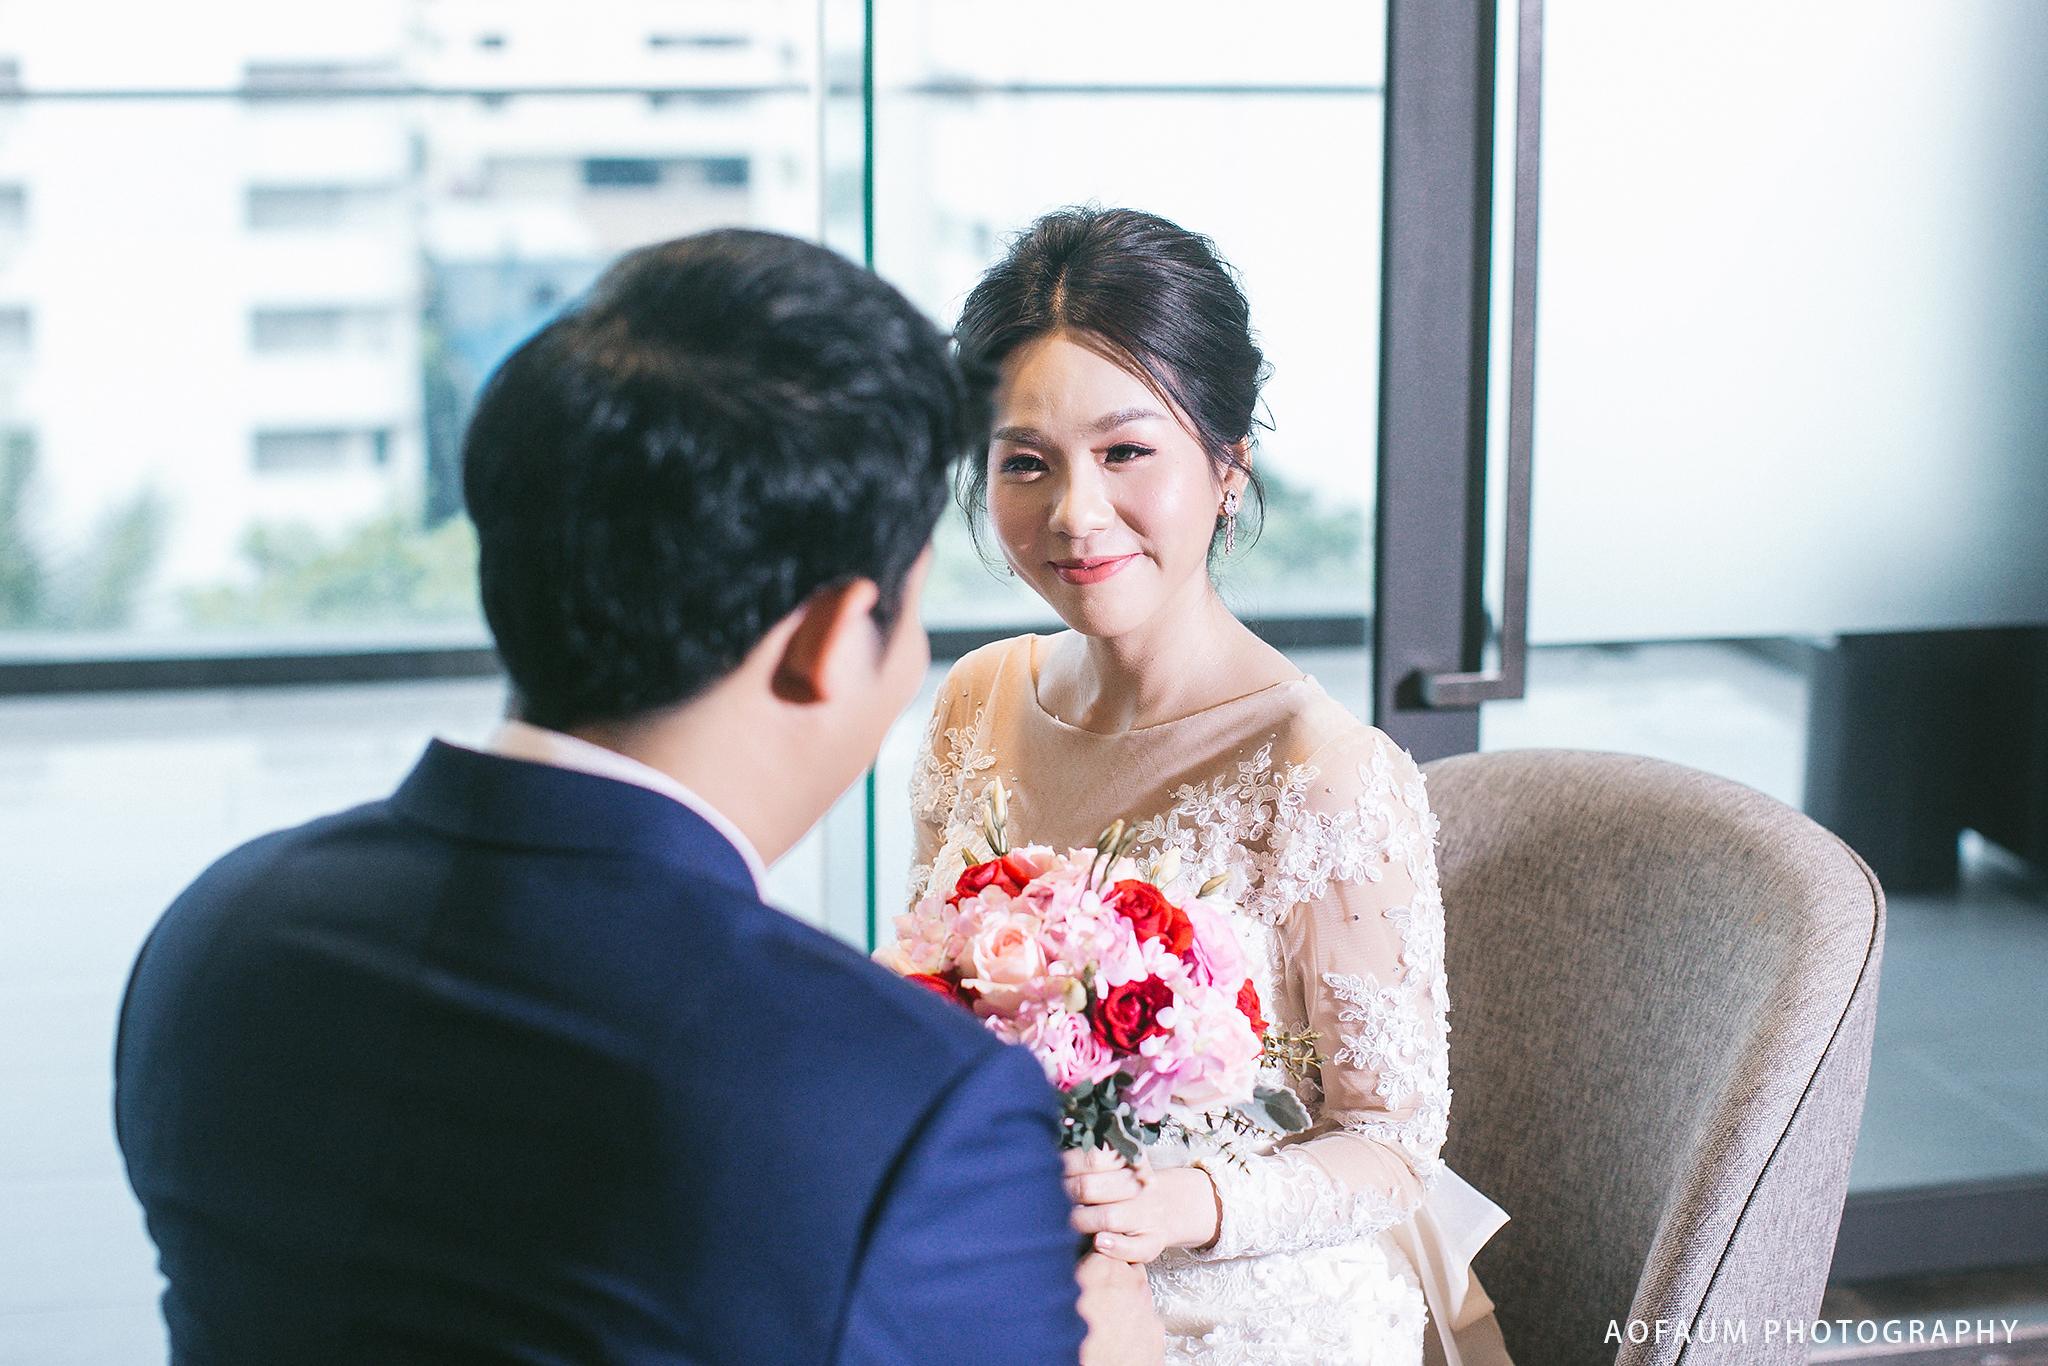 undefined รับส่วนลดแพ็กเกจแต่งงานถึง 10%  @Novotel Bangkok Sukhumvit 20 ลงทะเบียนล่วงหน้ารับบัตรชมภาพยนตร์ที่ Emquartier 2 ใบ ทันที!